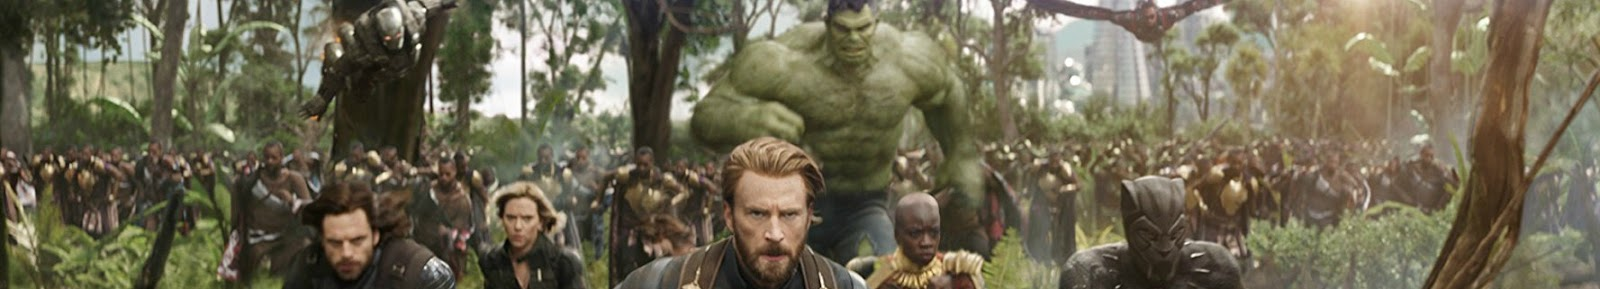 Avengers: Infinity War (2018) Banner